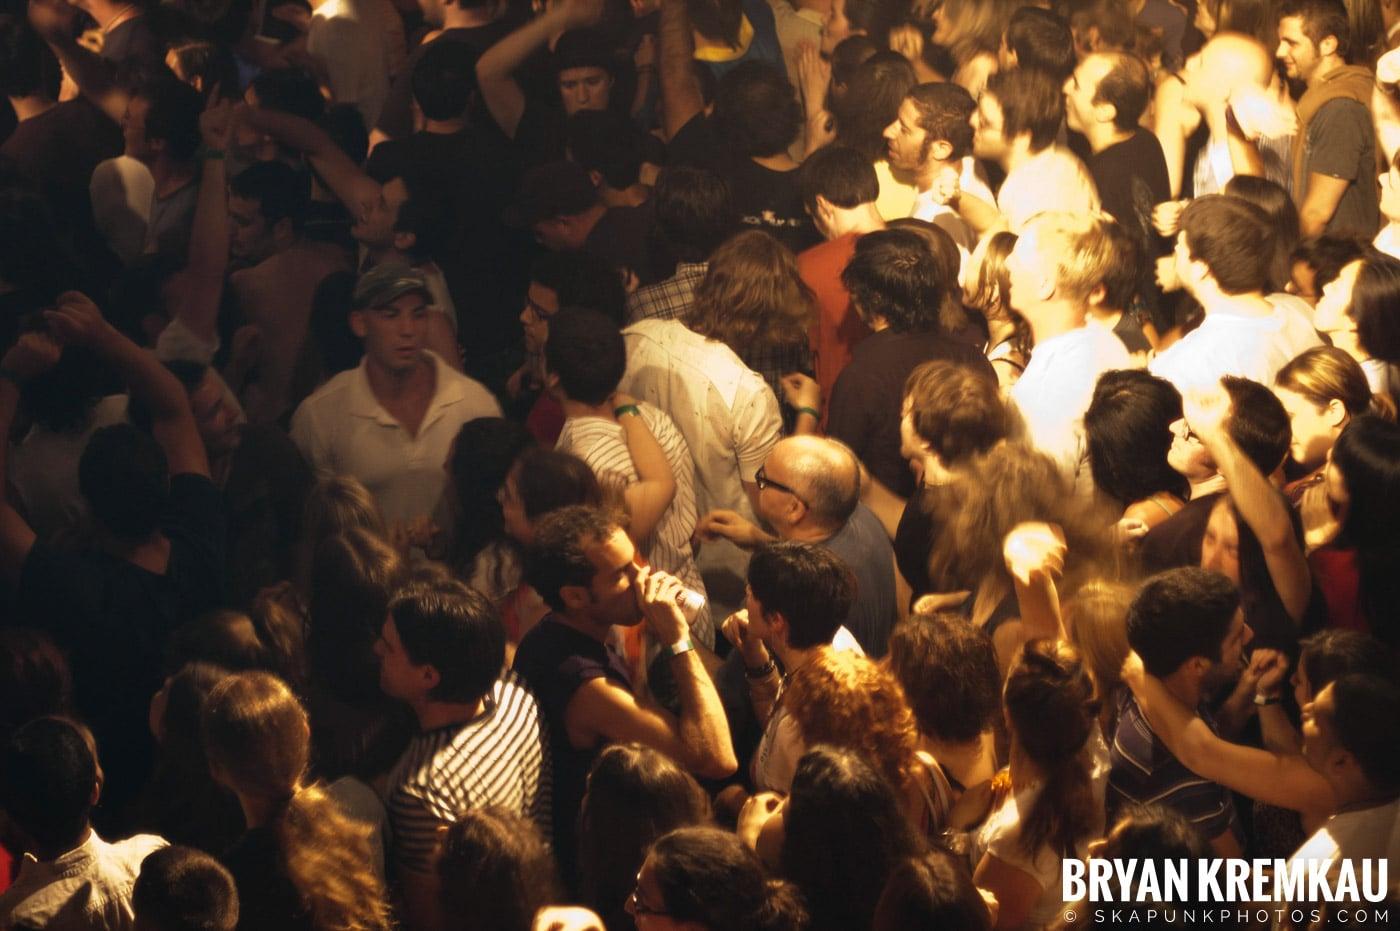 Gogol Bordello @ Irving Plaza, NYC - 7.22.07 (10)